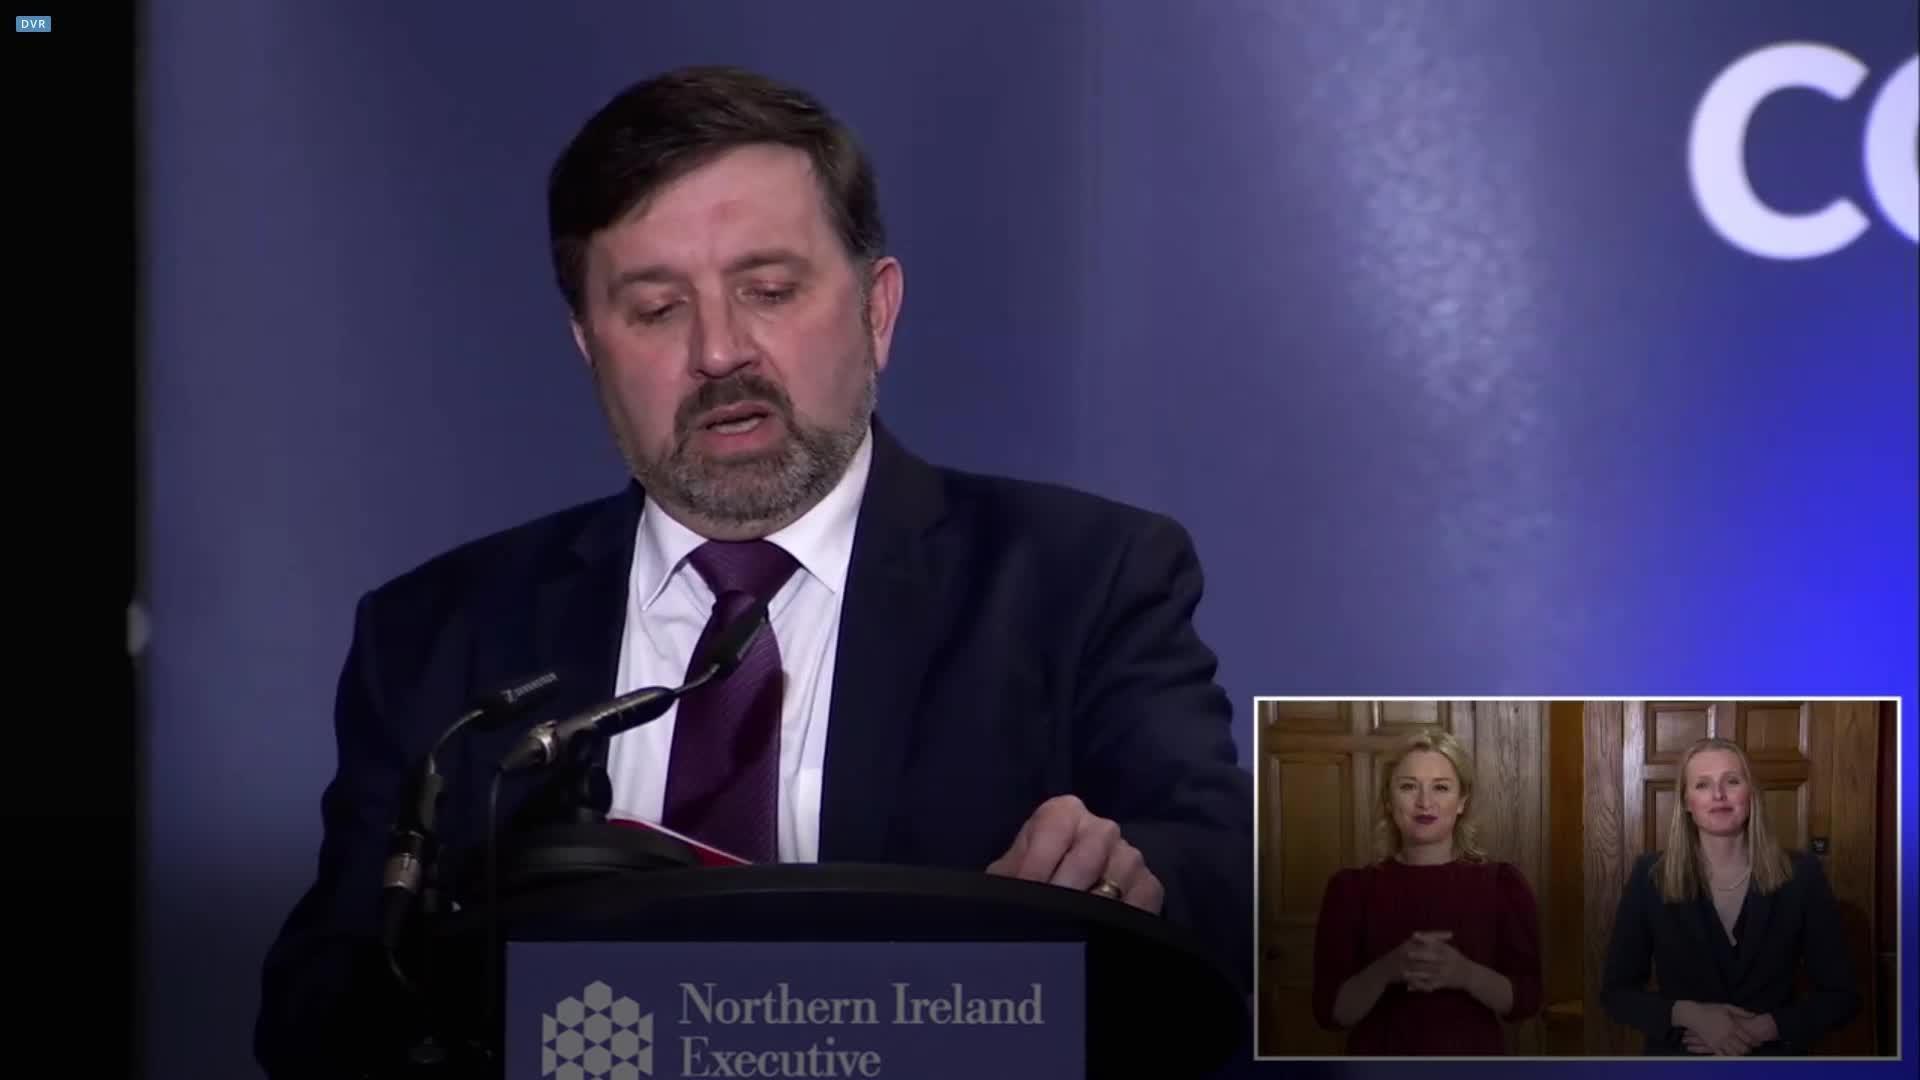 No new coronavirus deaths reported in Northern Ireland